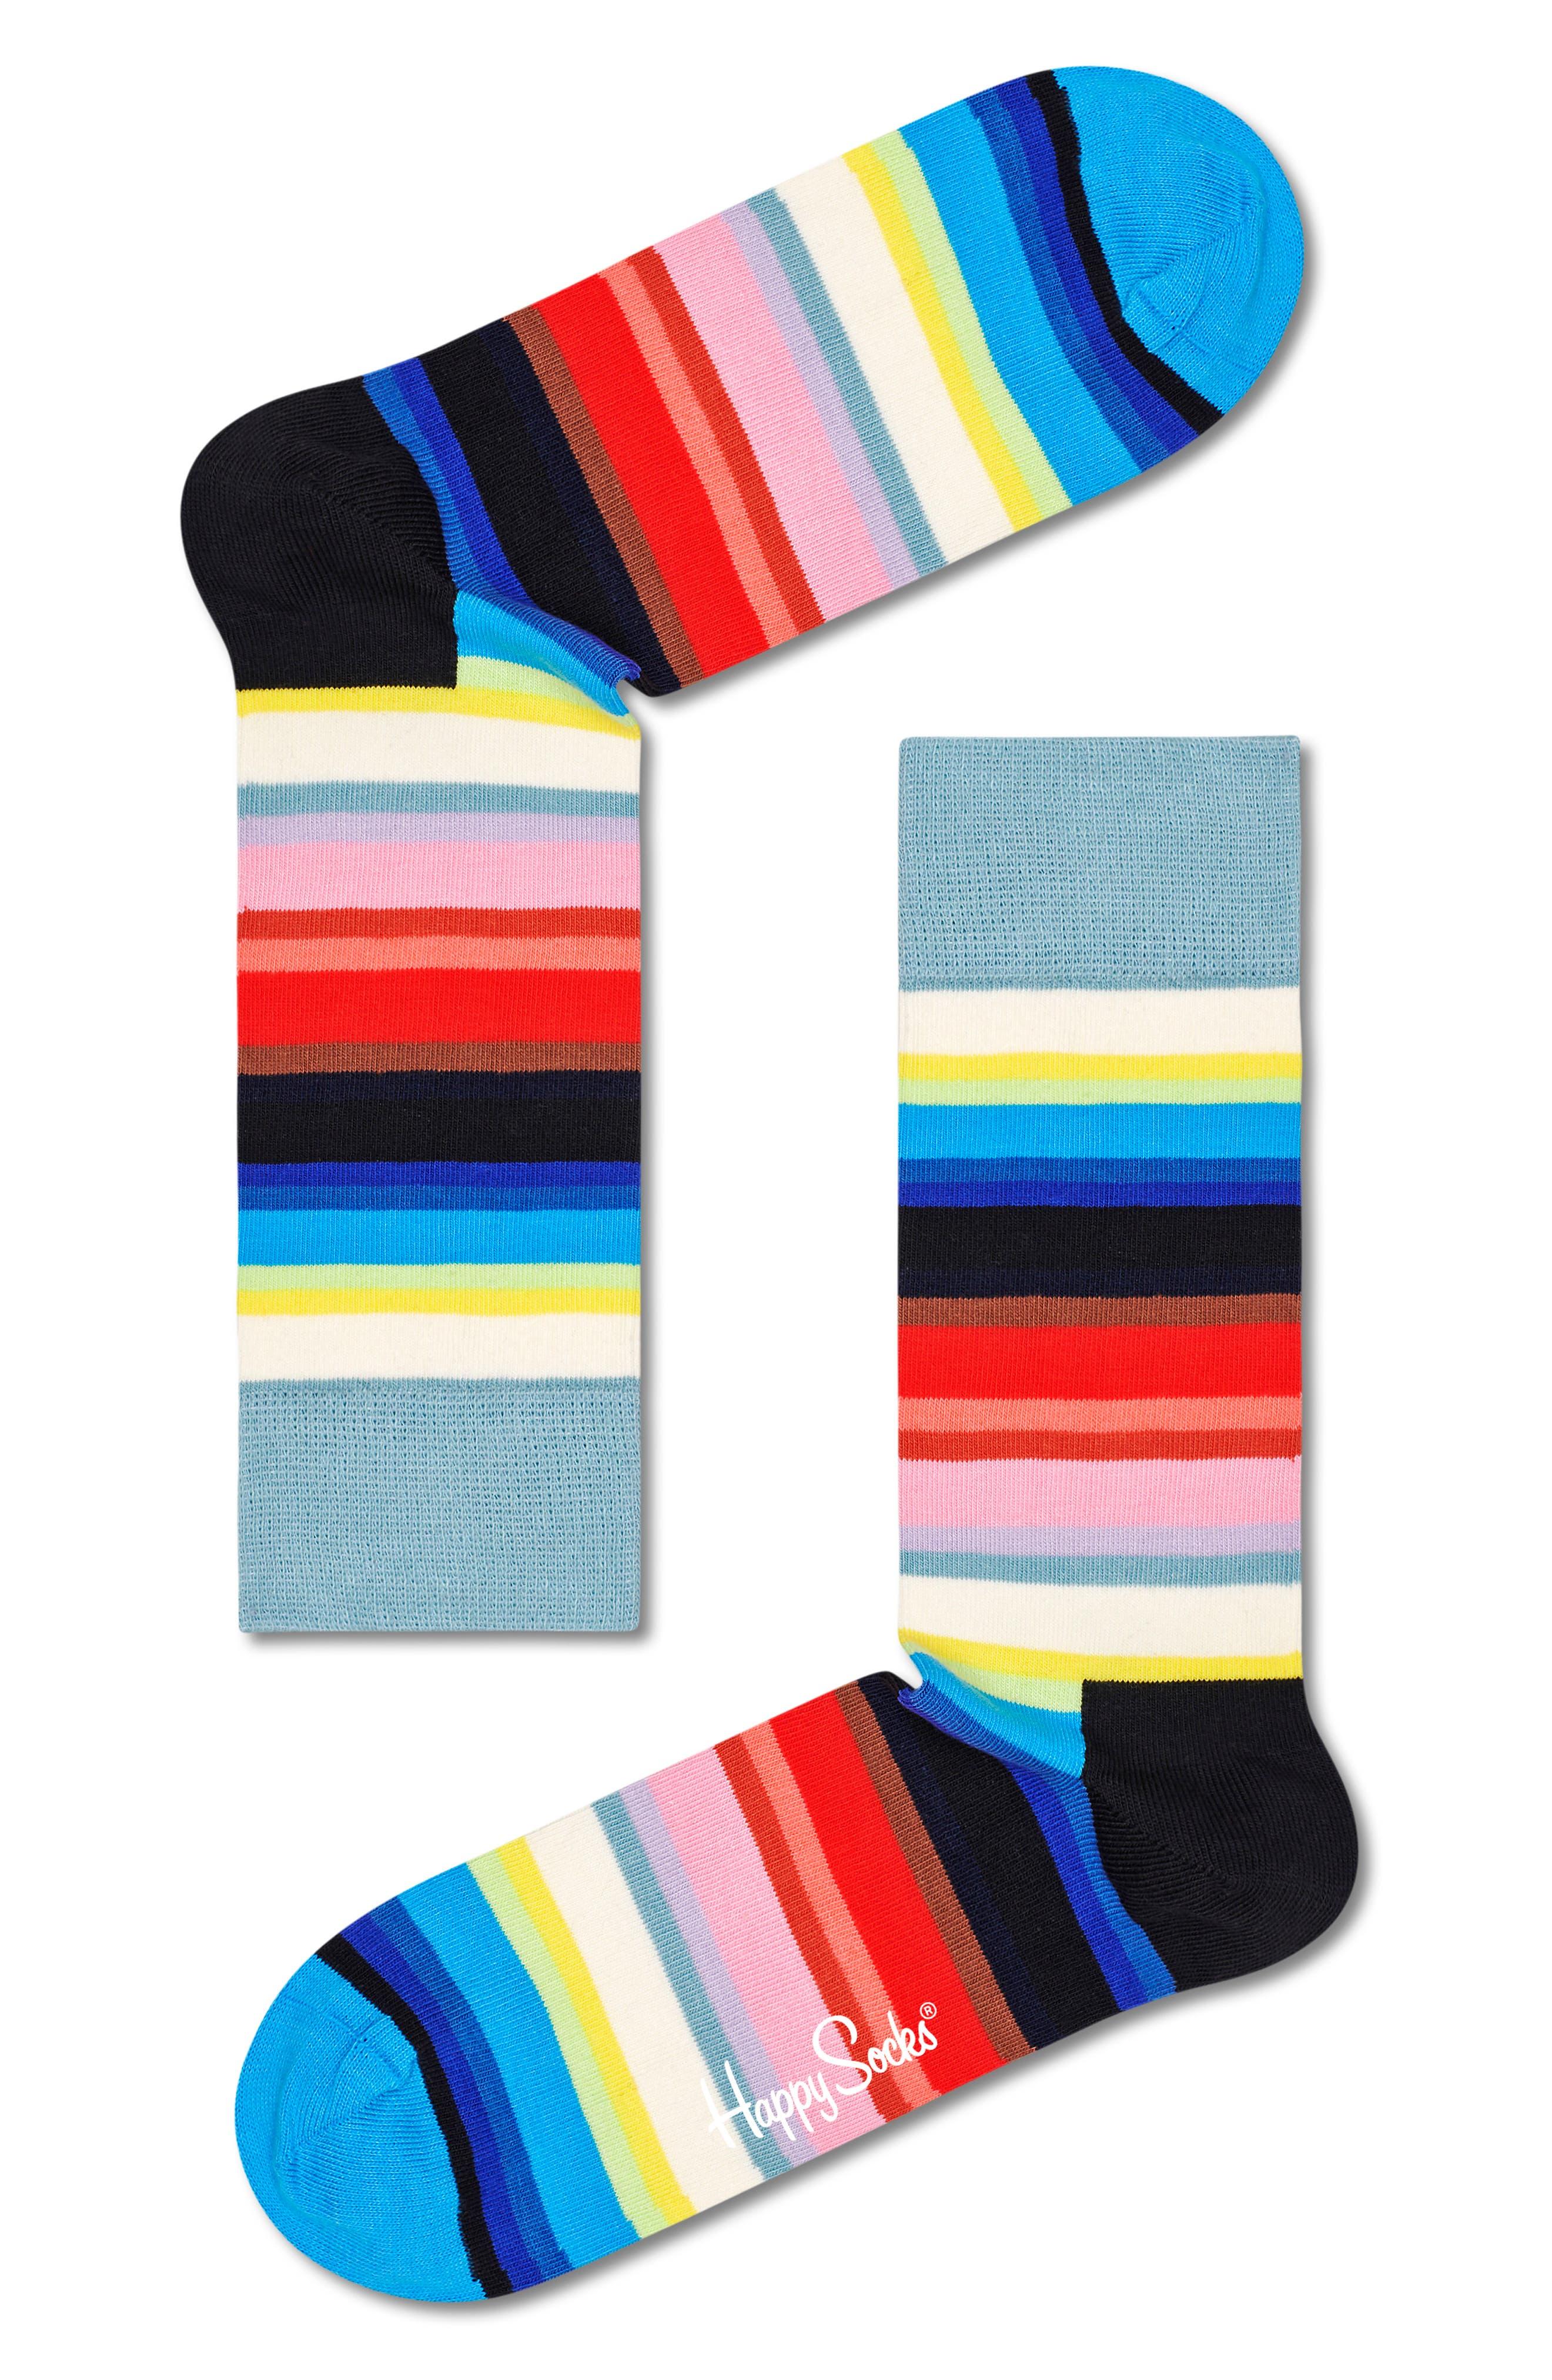 Gradient Crew Socks